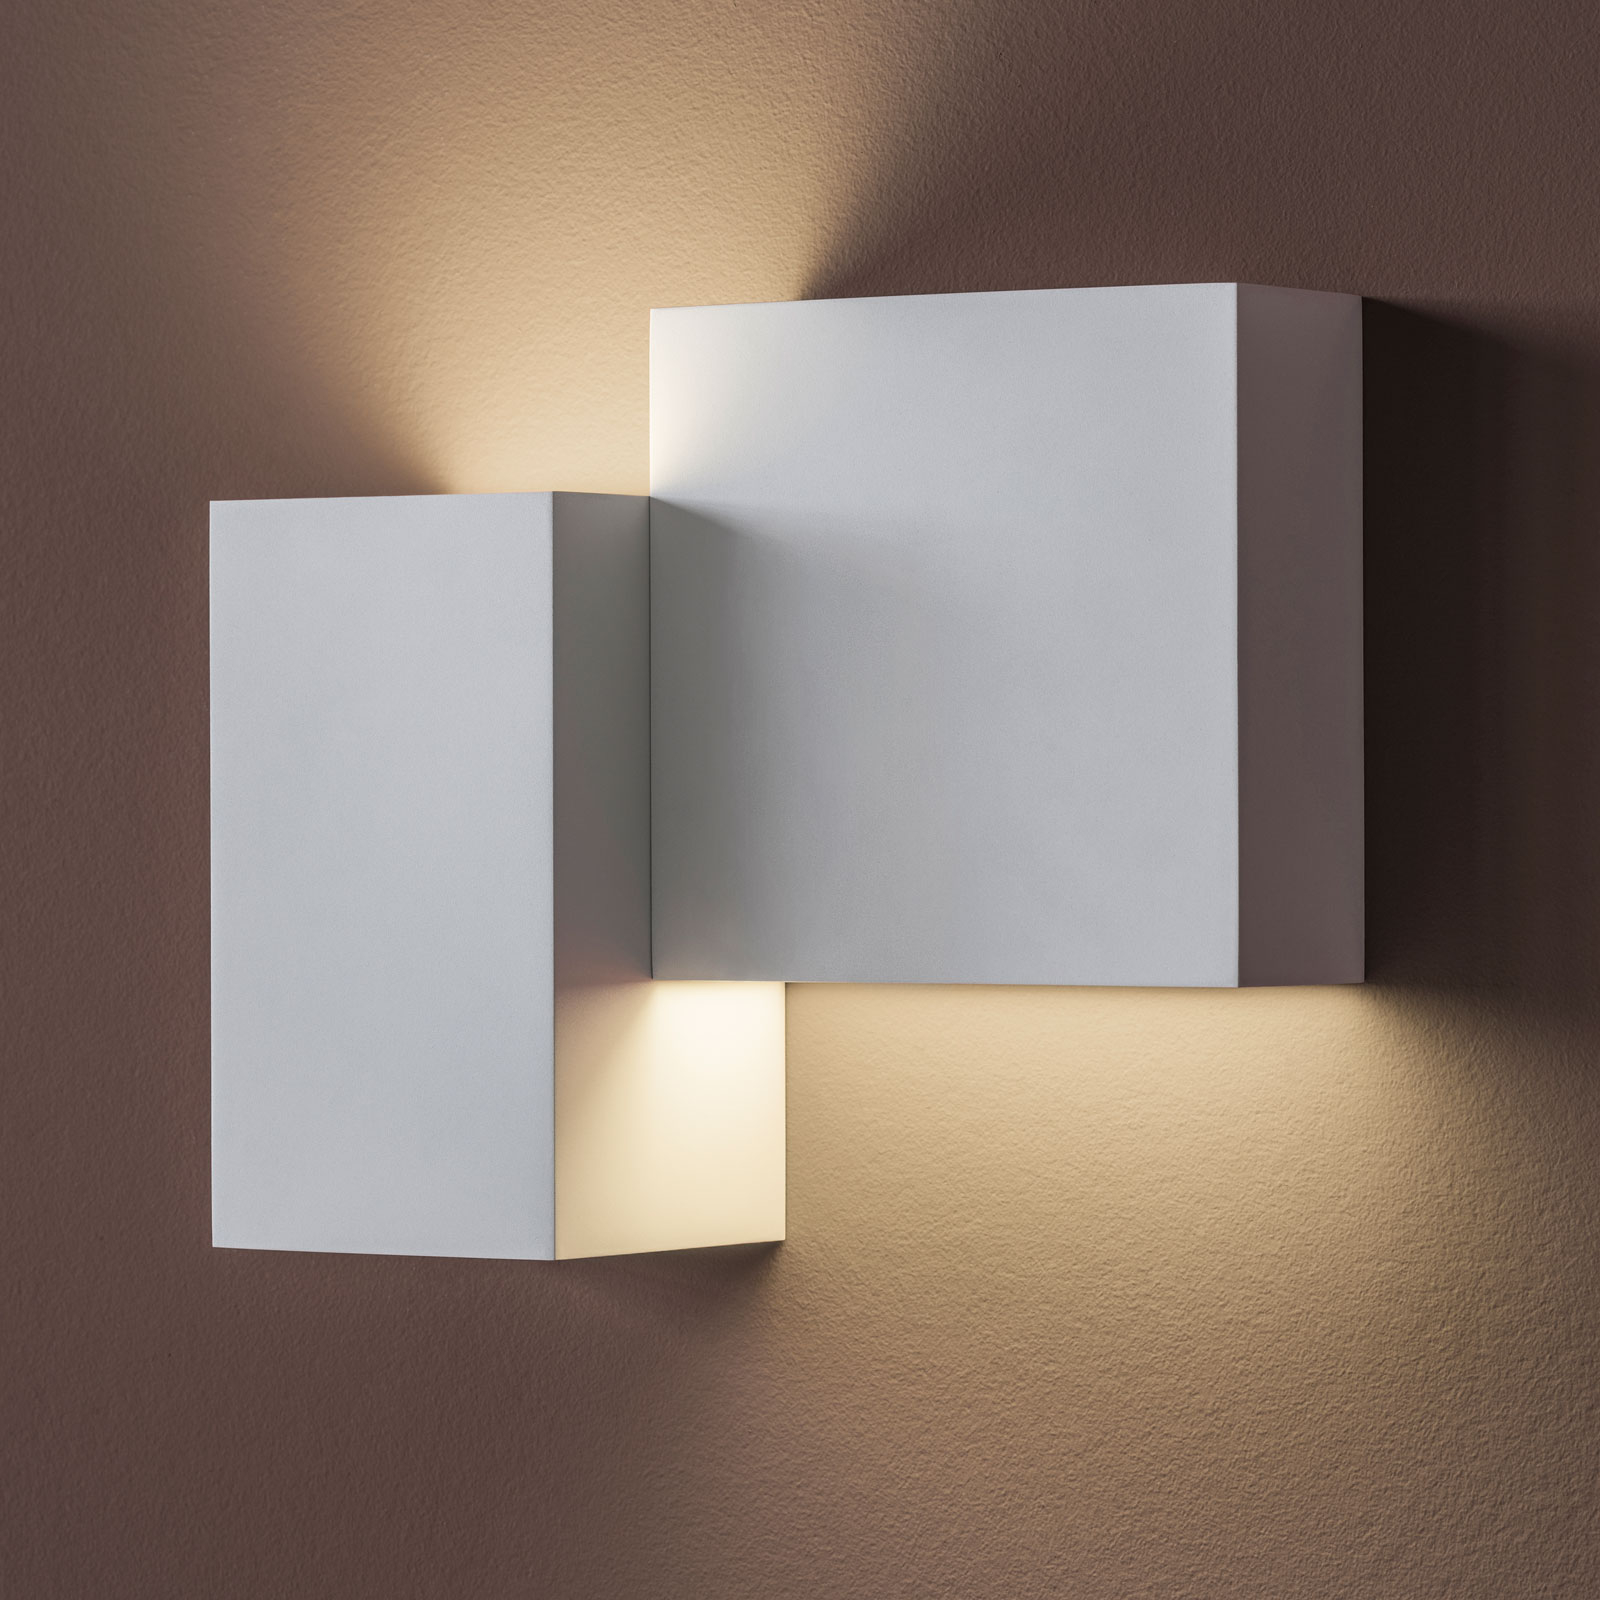 Vibia Structural 2602 LED-vegglampe, lysegrå